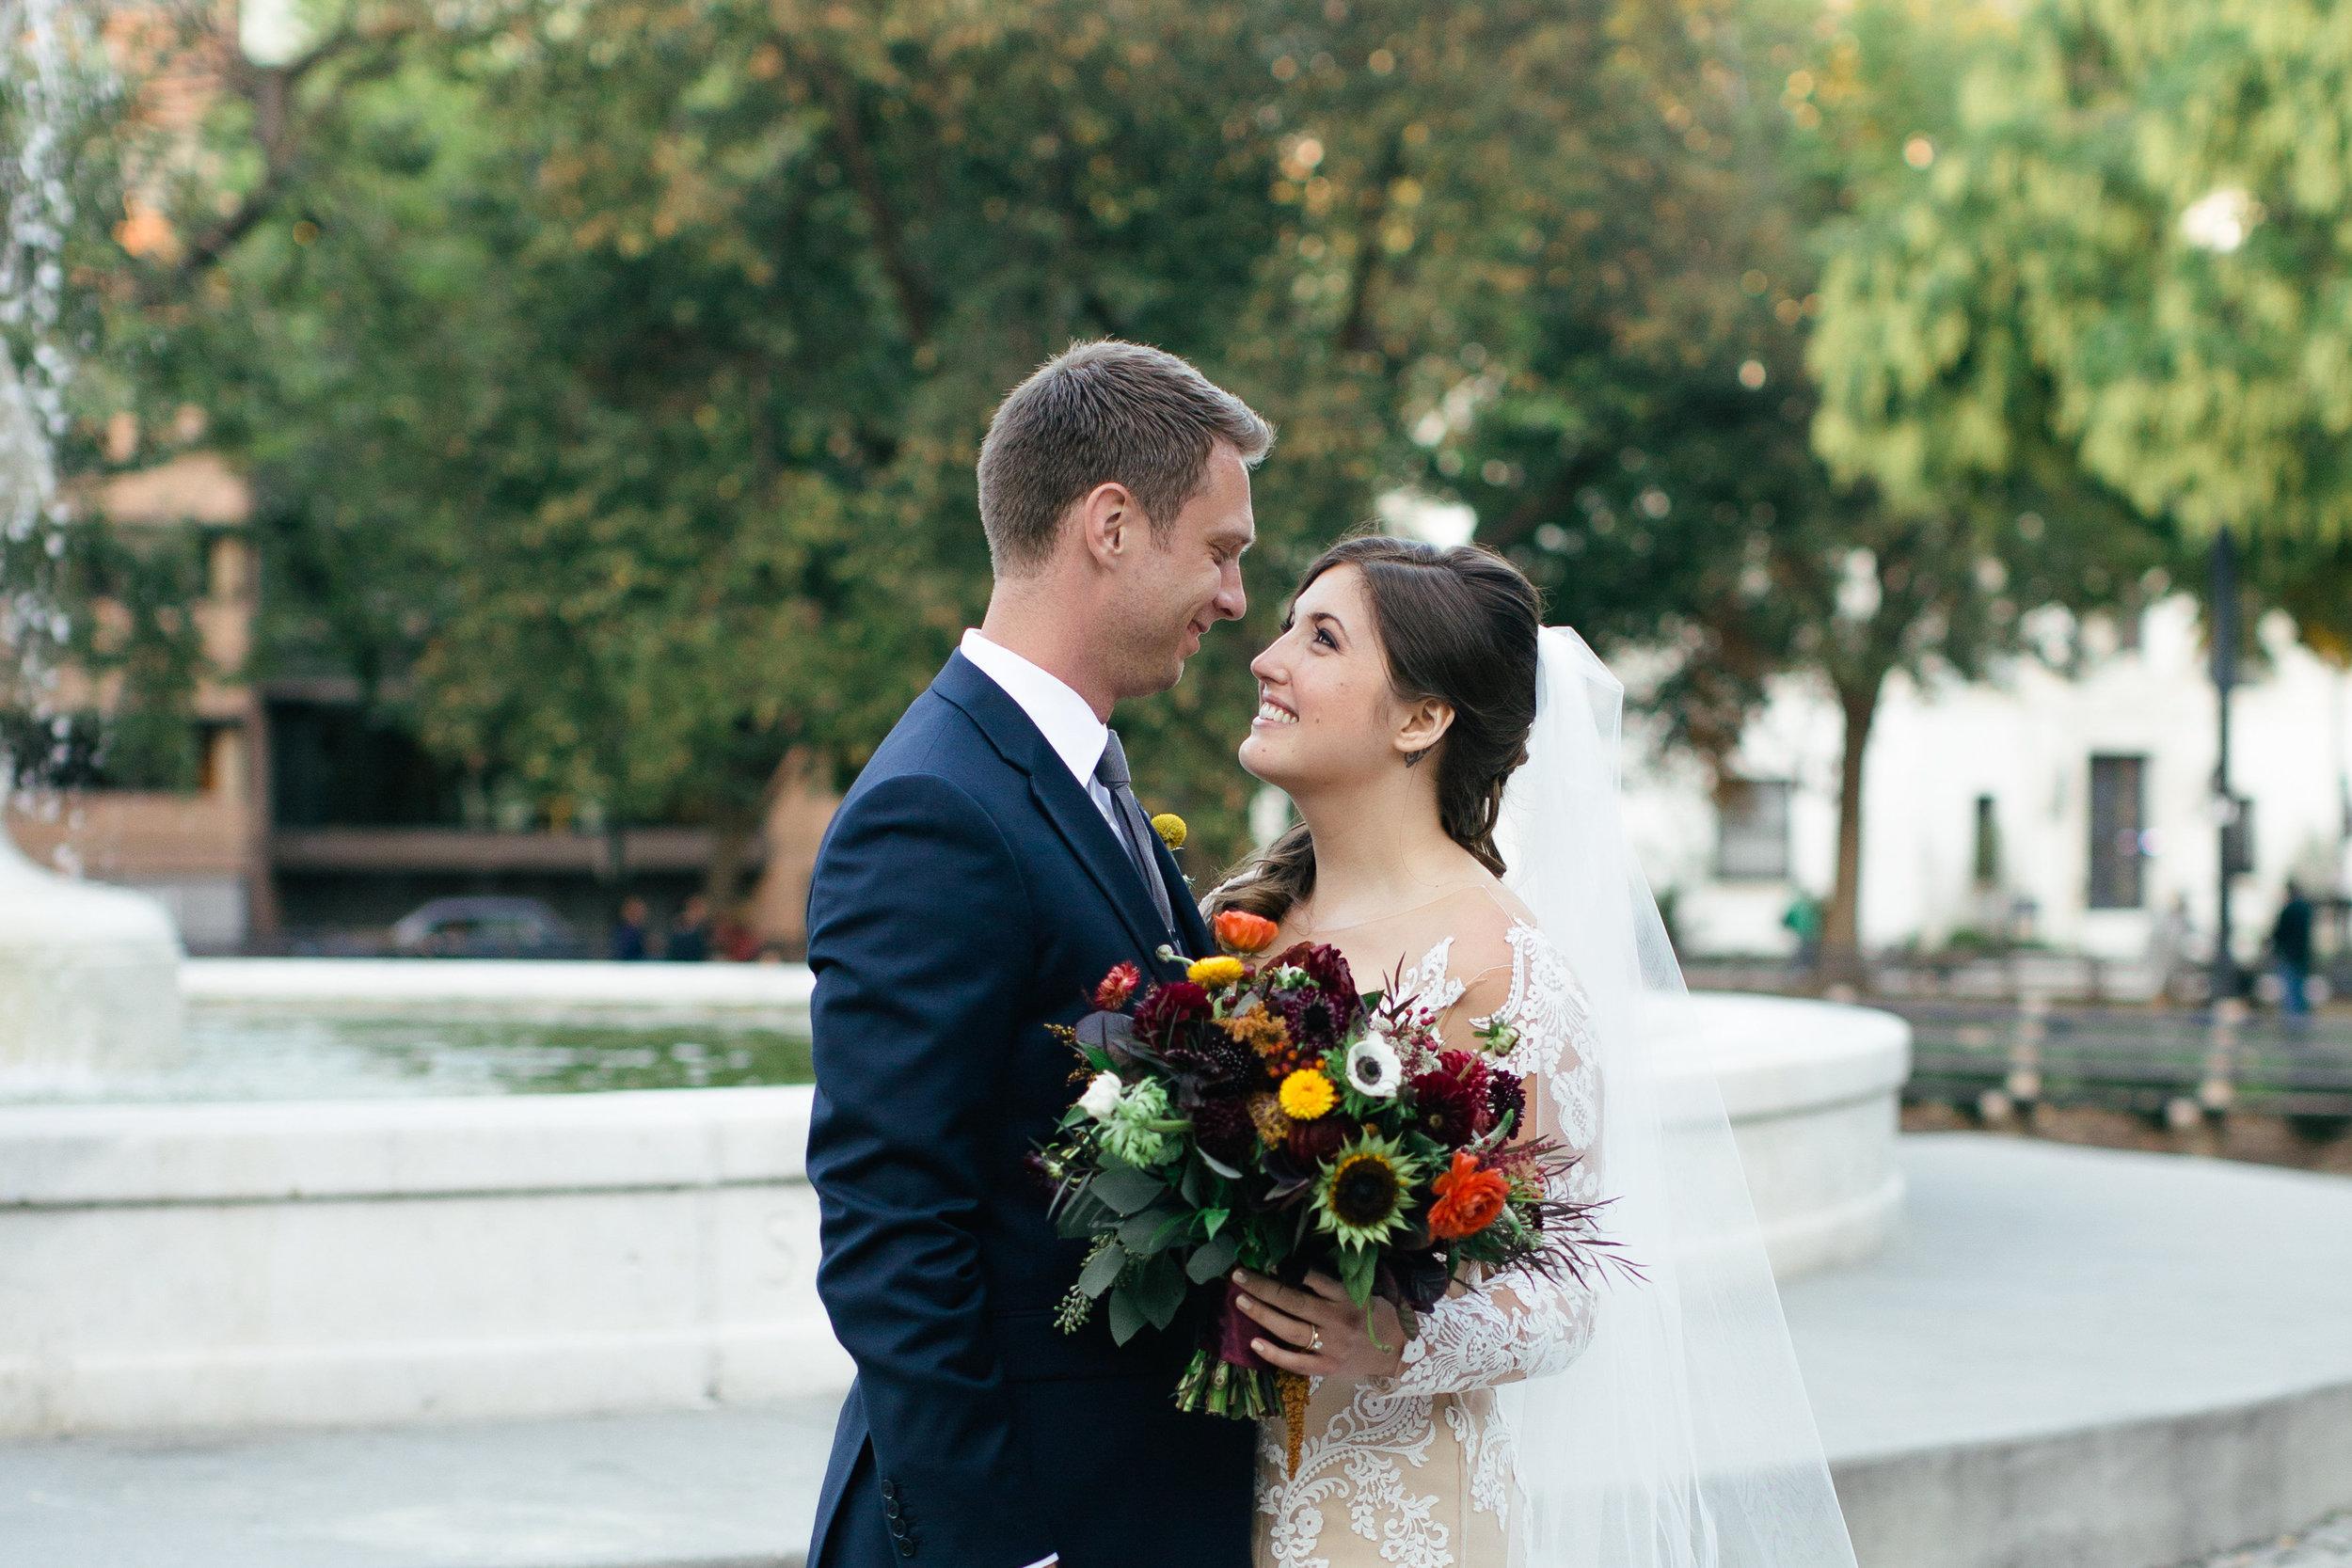 Dupon Circle Wedding | Washington DC Wedding Photography | Rebecca Wilcher Photography -19.jpg